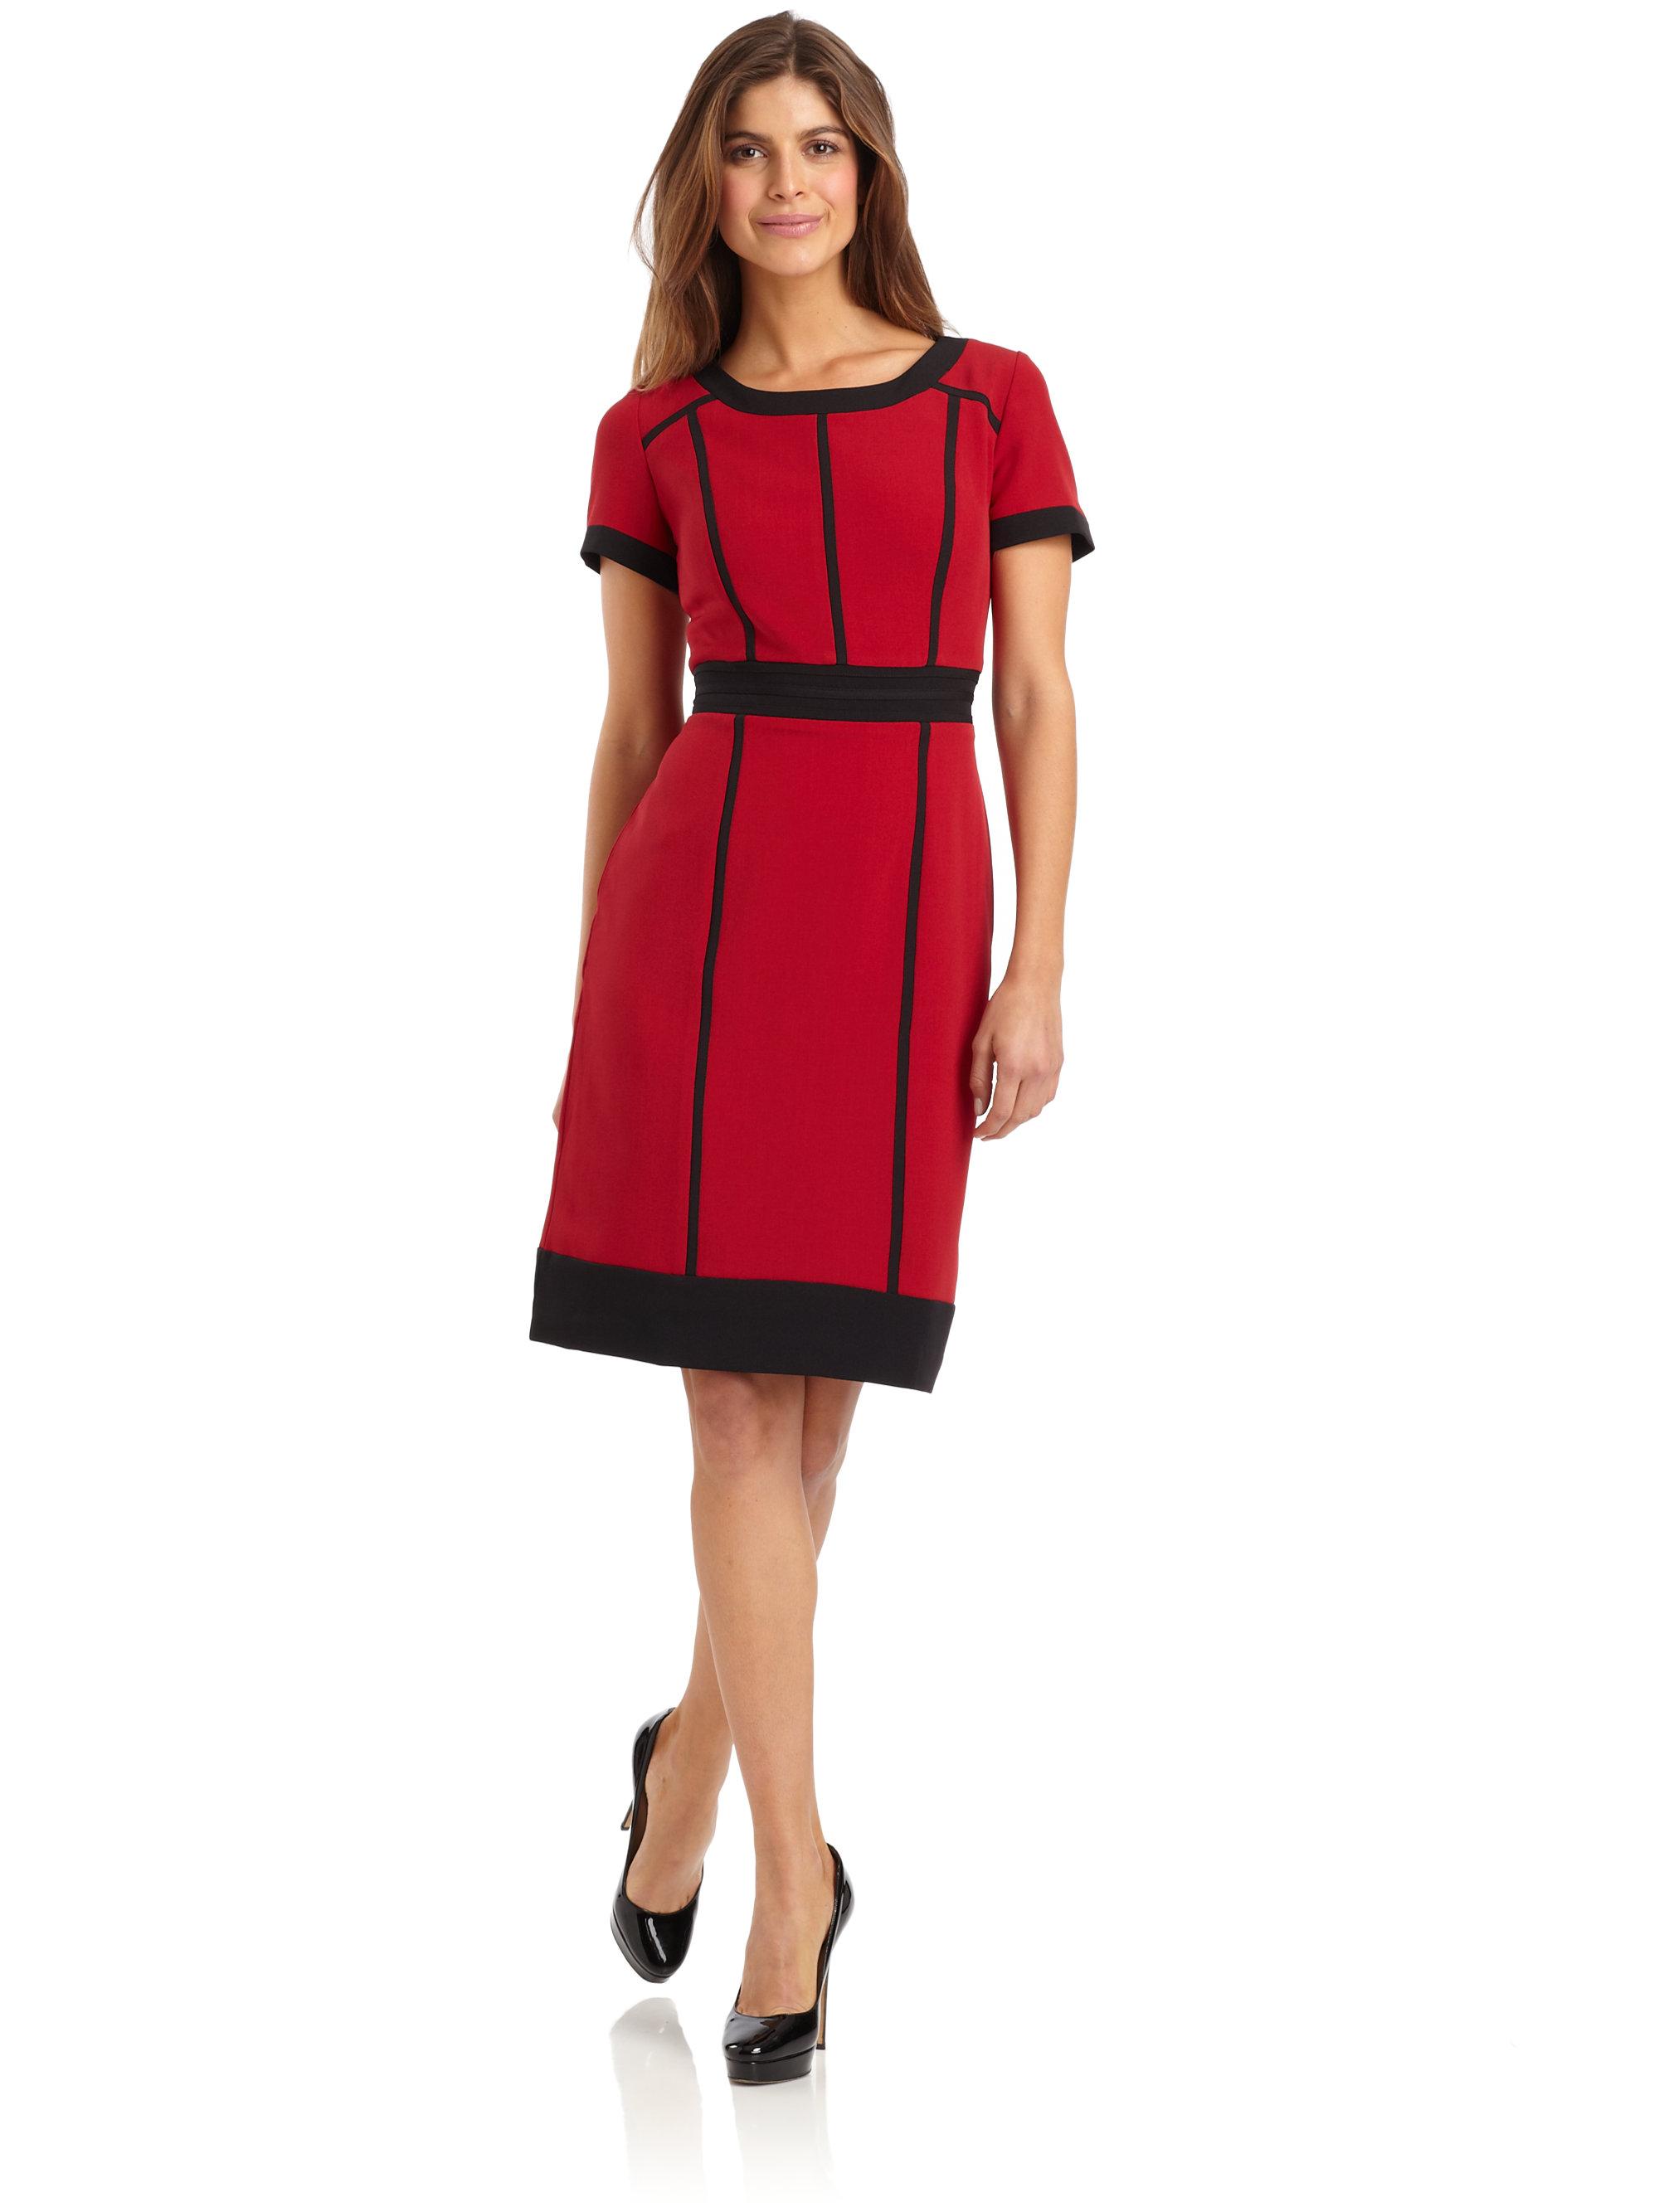 Chetta b Colorblock Dress in Red